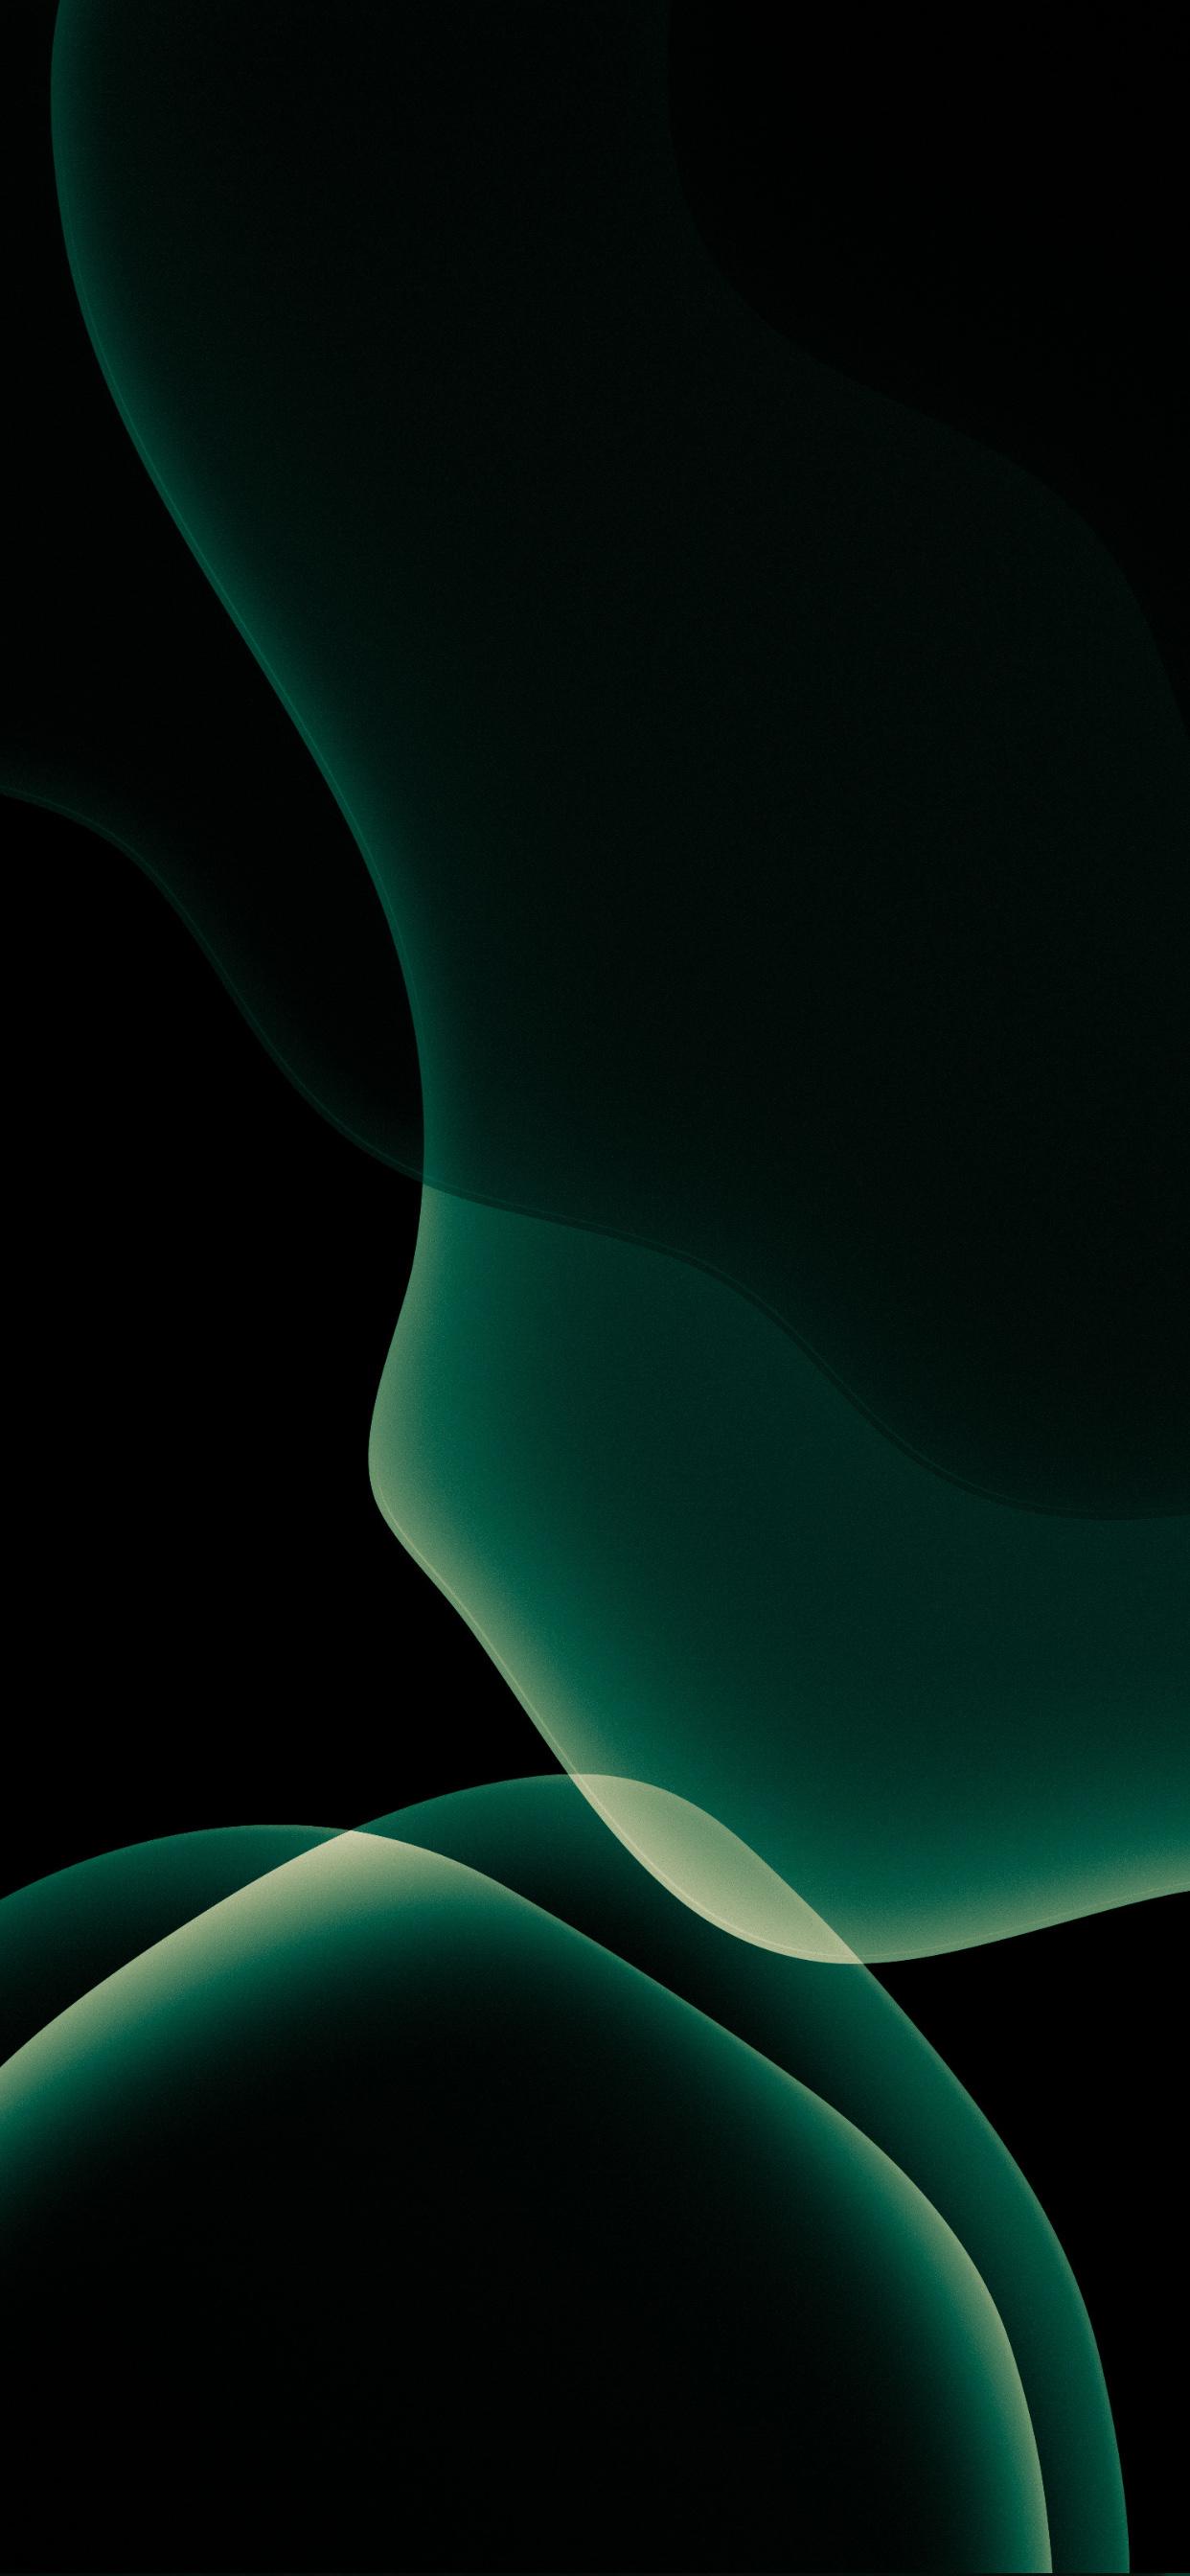 Midnight Green wallpapers 1242x2688